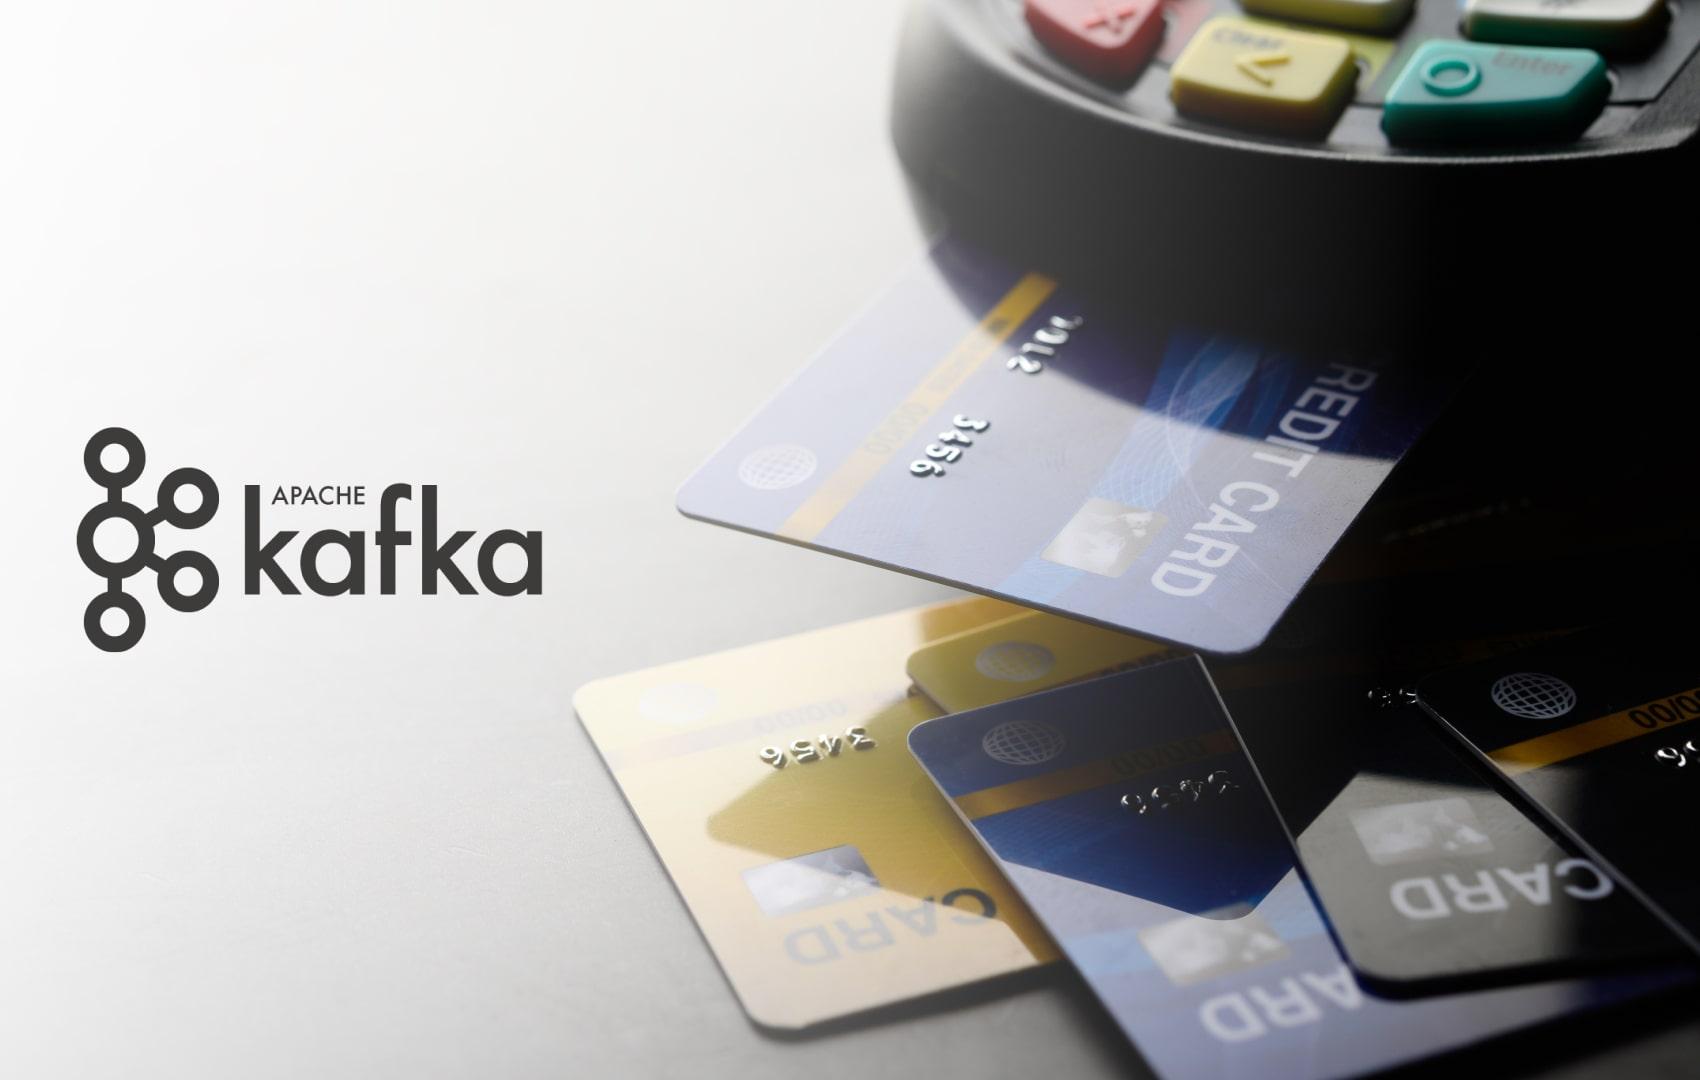 Apache Kafka Transaction Semantics